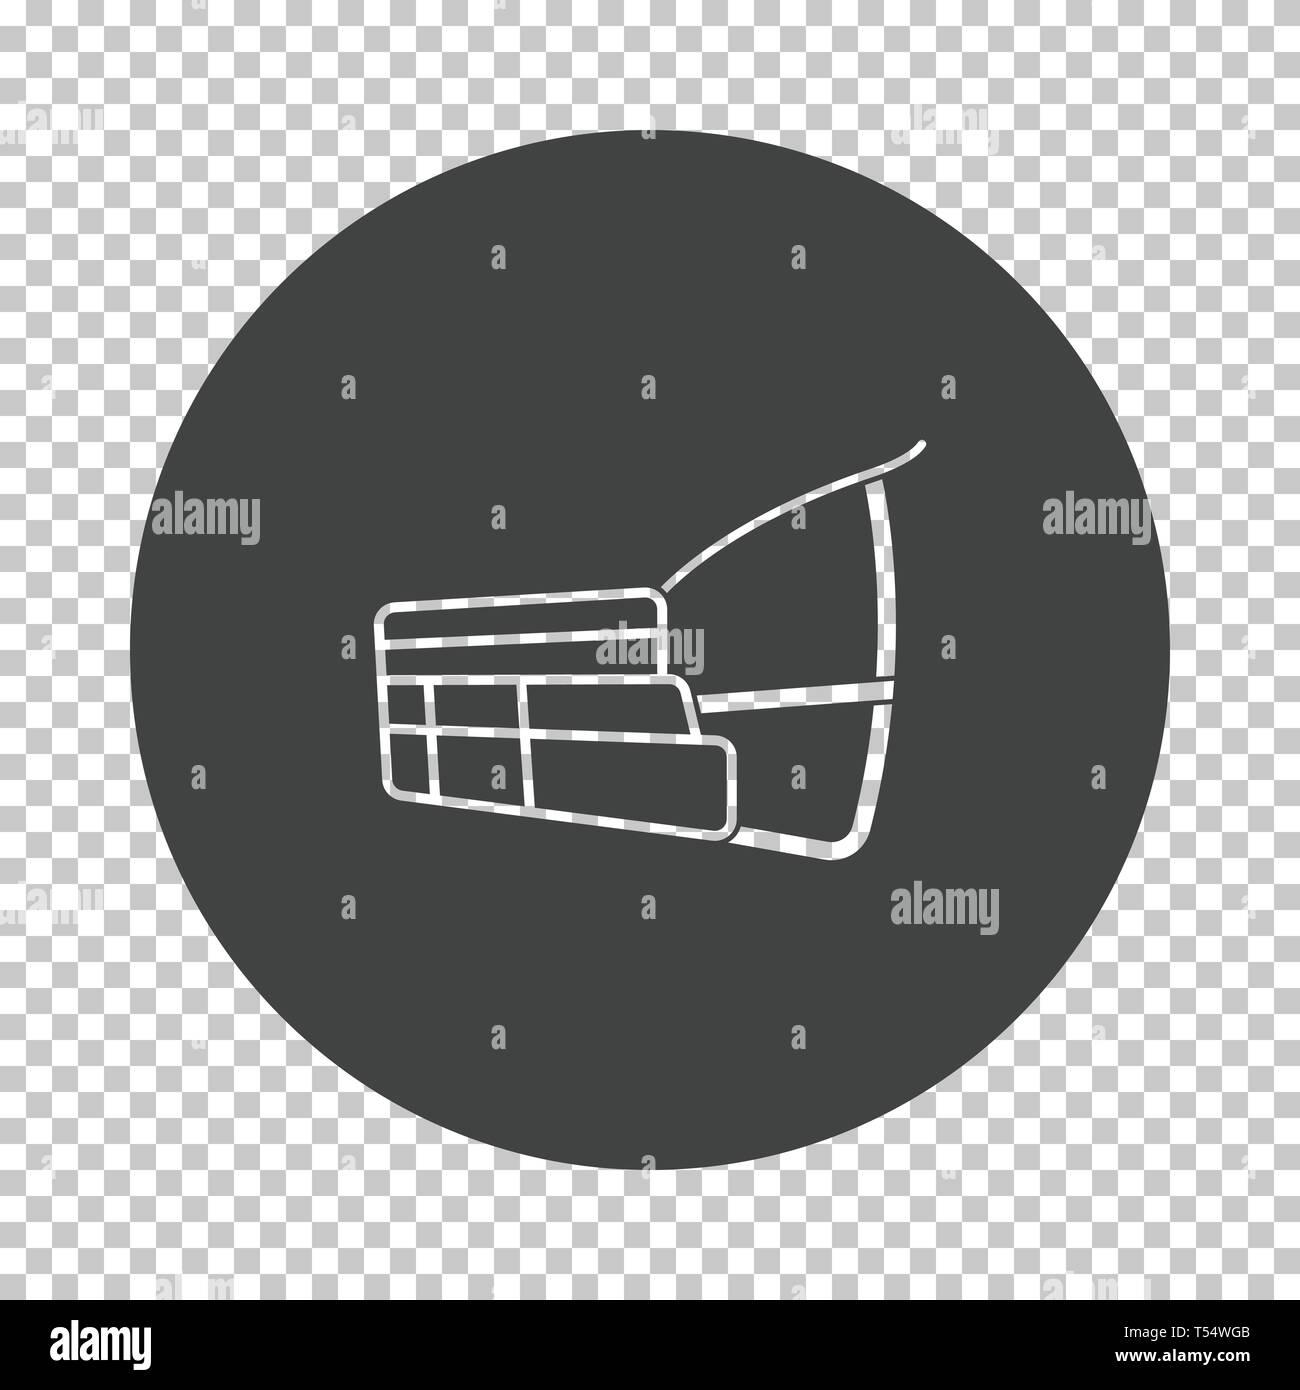 Dog muzzle icon. Subtract stencil design on tranparency grid. Vector illustration. Stock Vector